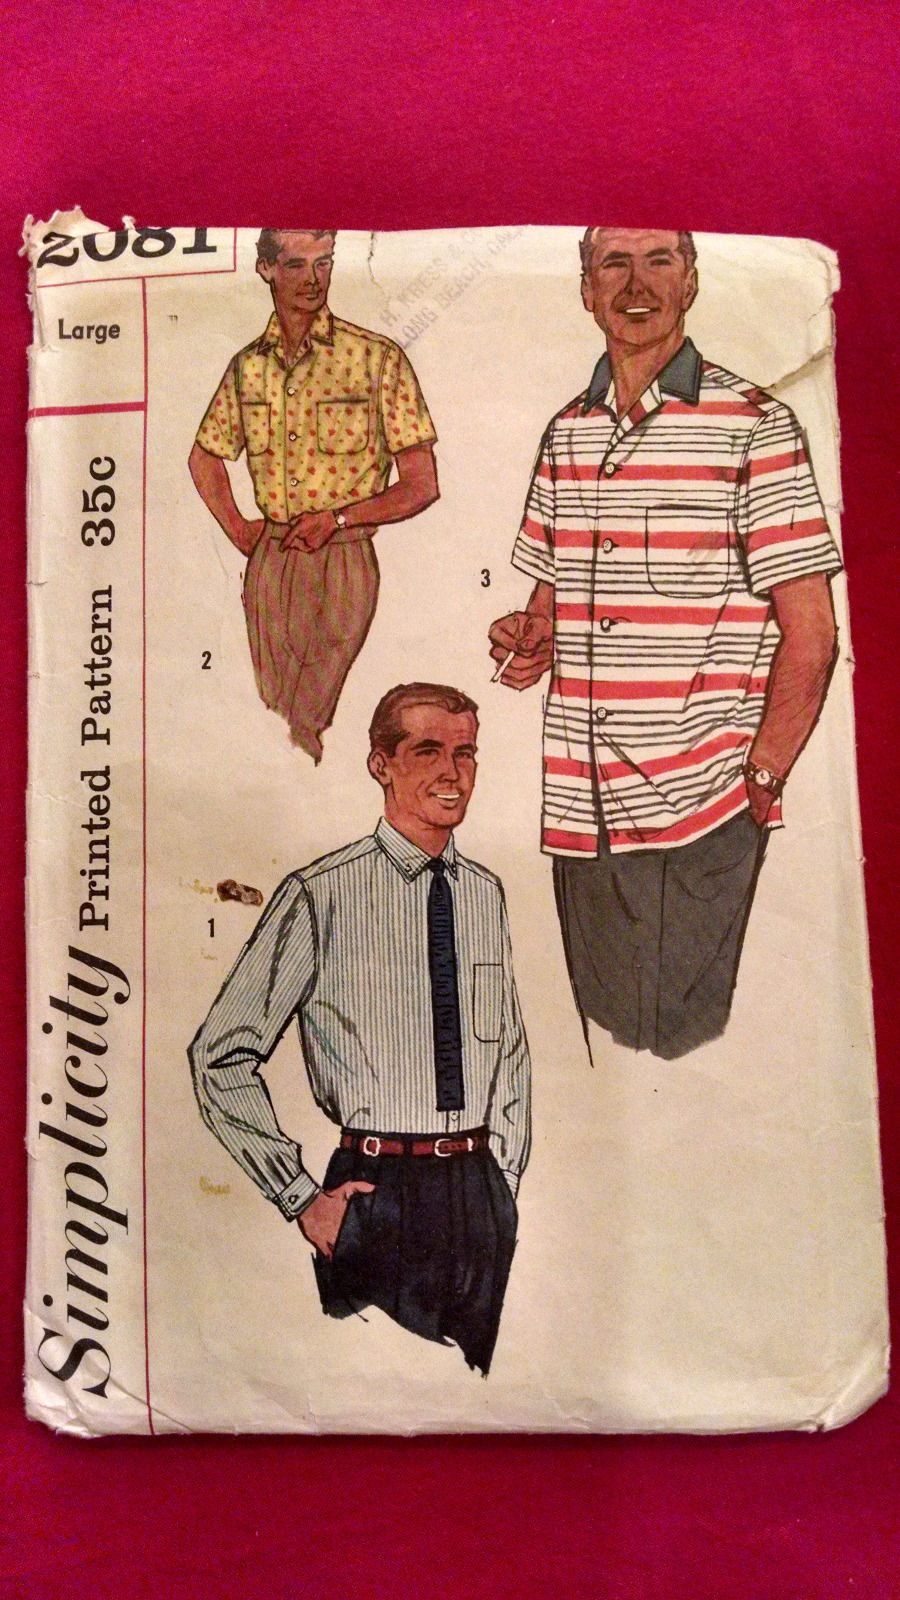 01a52a6724cc2 S l1600. S l1600. Previous. Simplicity 2081 Mens Classic Retro Shirt Sewing  Pattern L Chest 42-44 ...